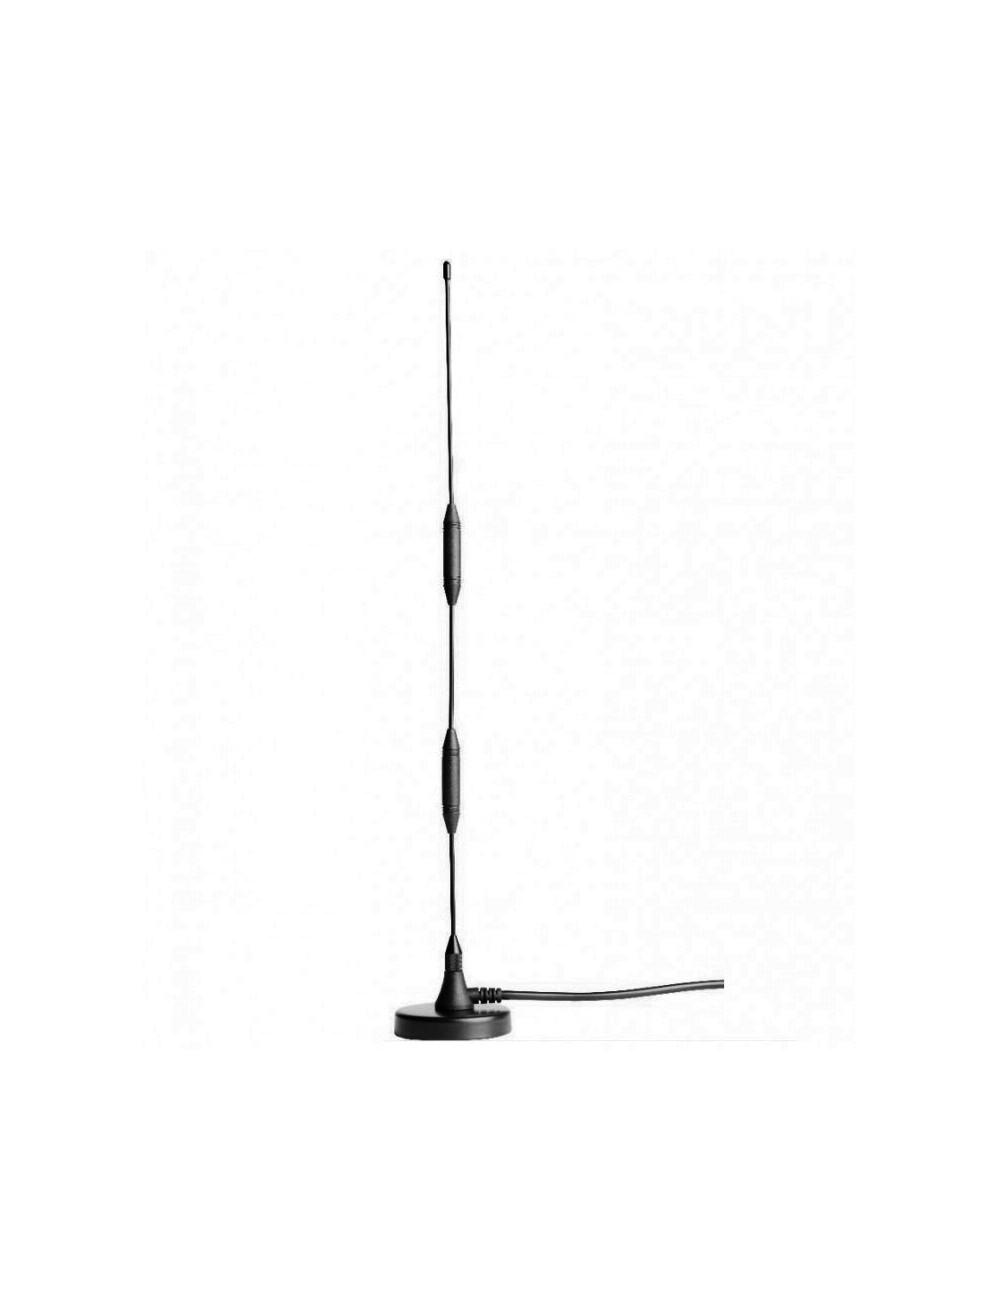 Antenna 3G/LTE 5dBi